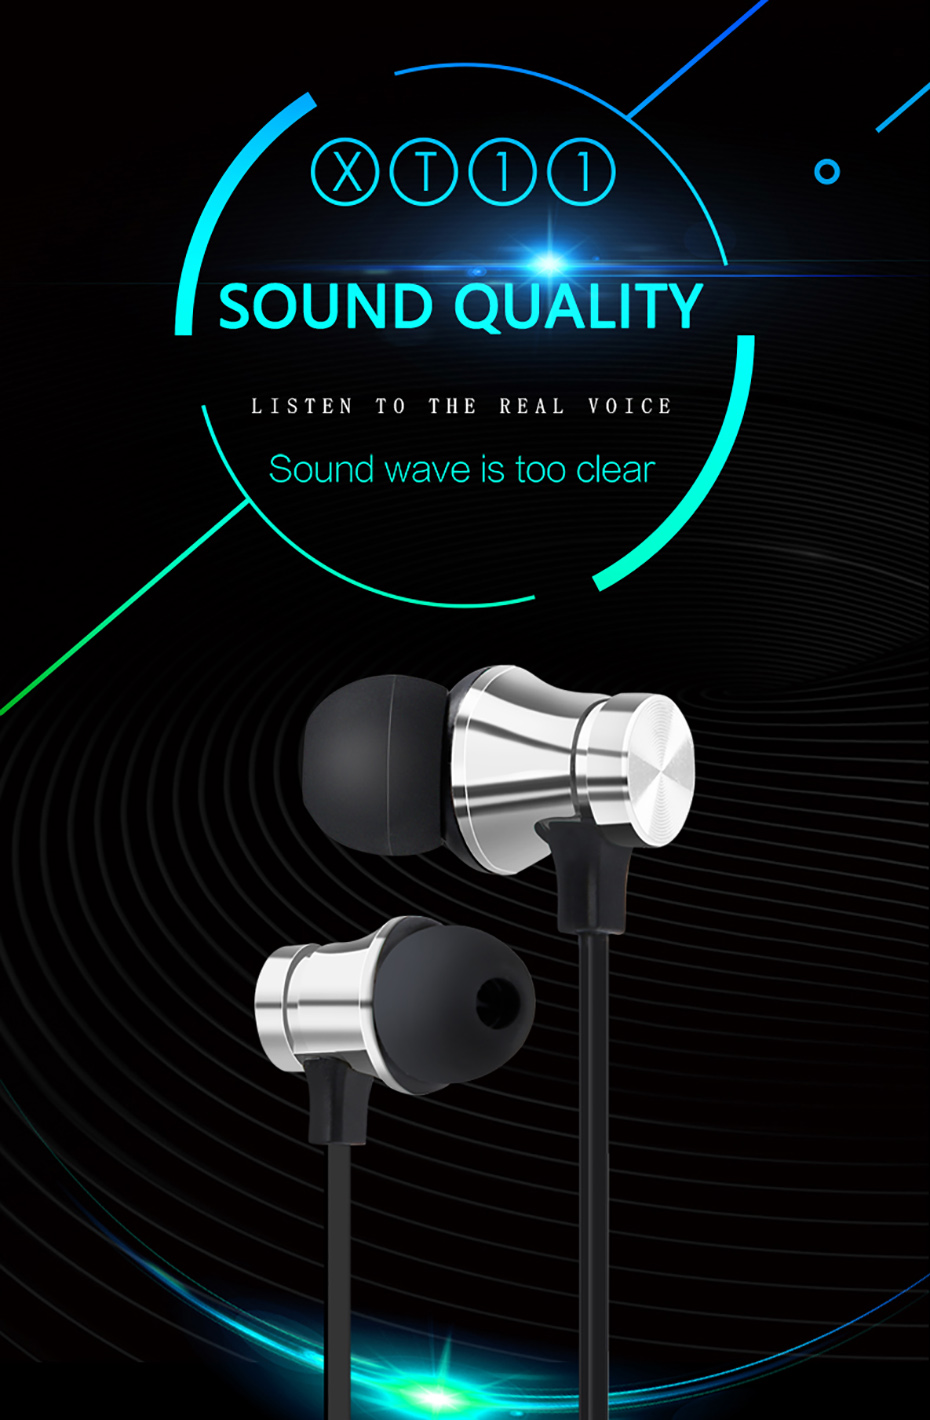 Newest Wireless Headphone Bluetooth Earphone Headphone For Phone Neckband sport earphone Auriculare CSR Bluetooth For Smart Phone 001